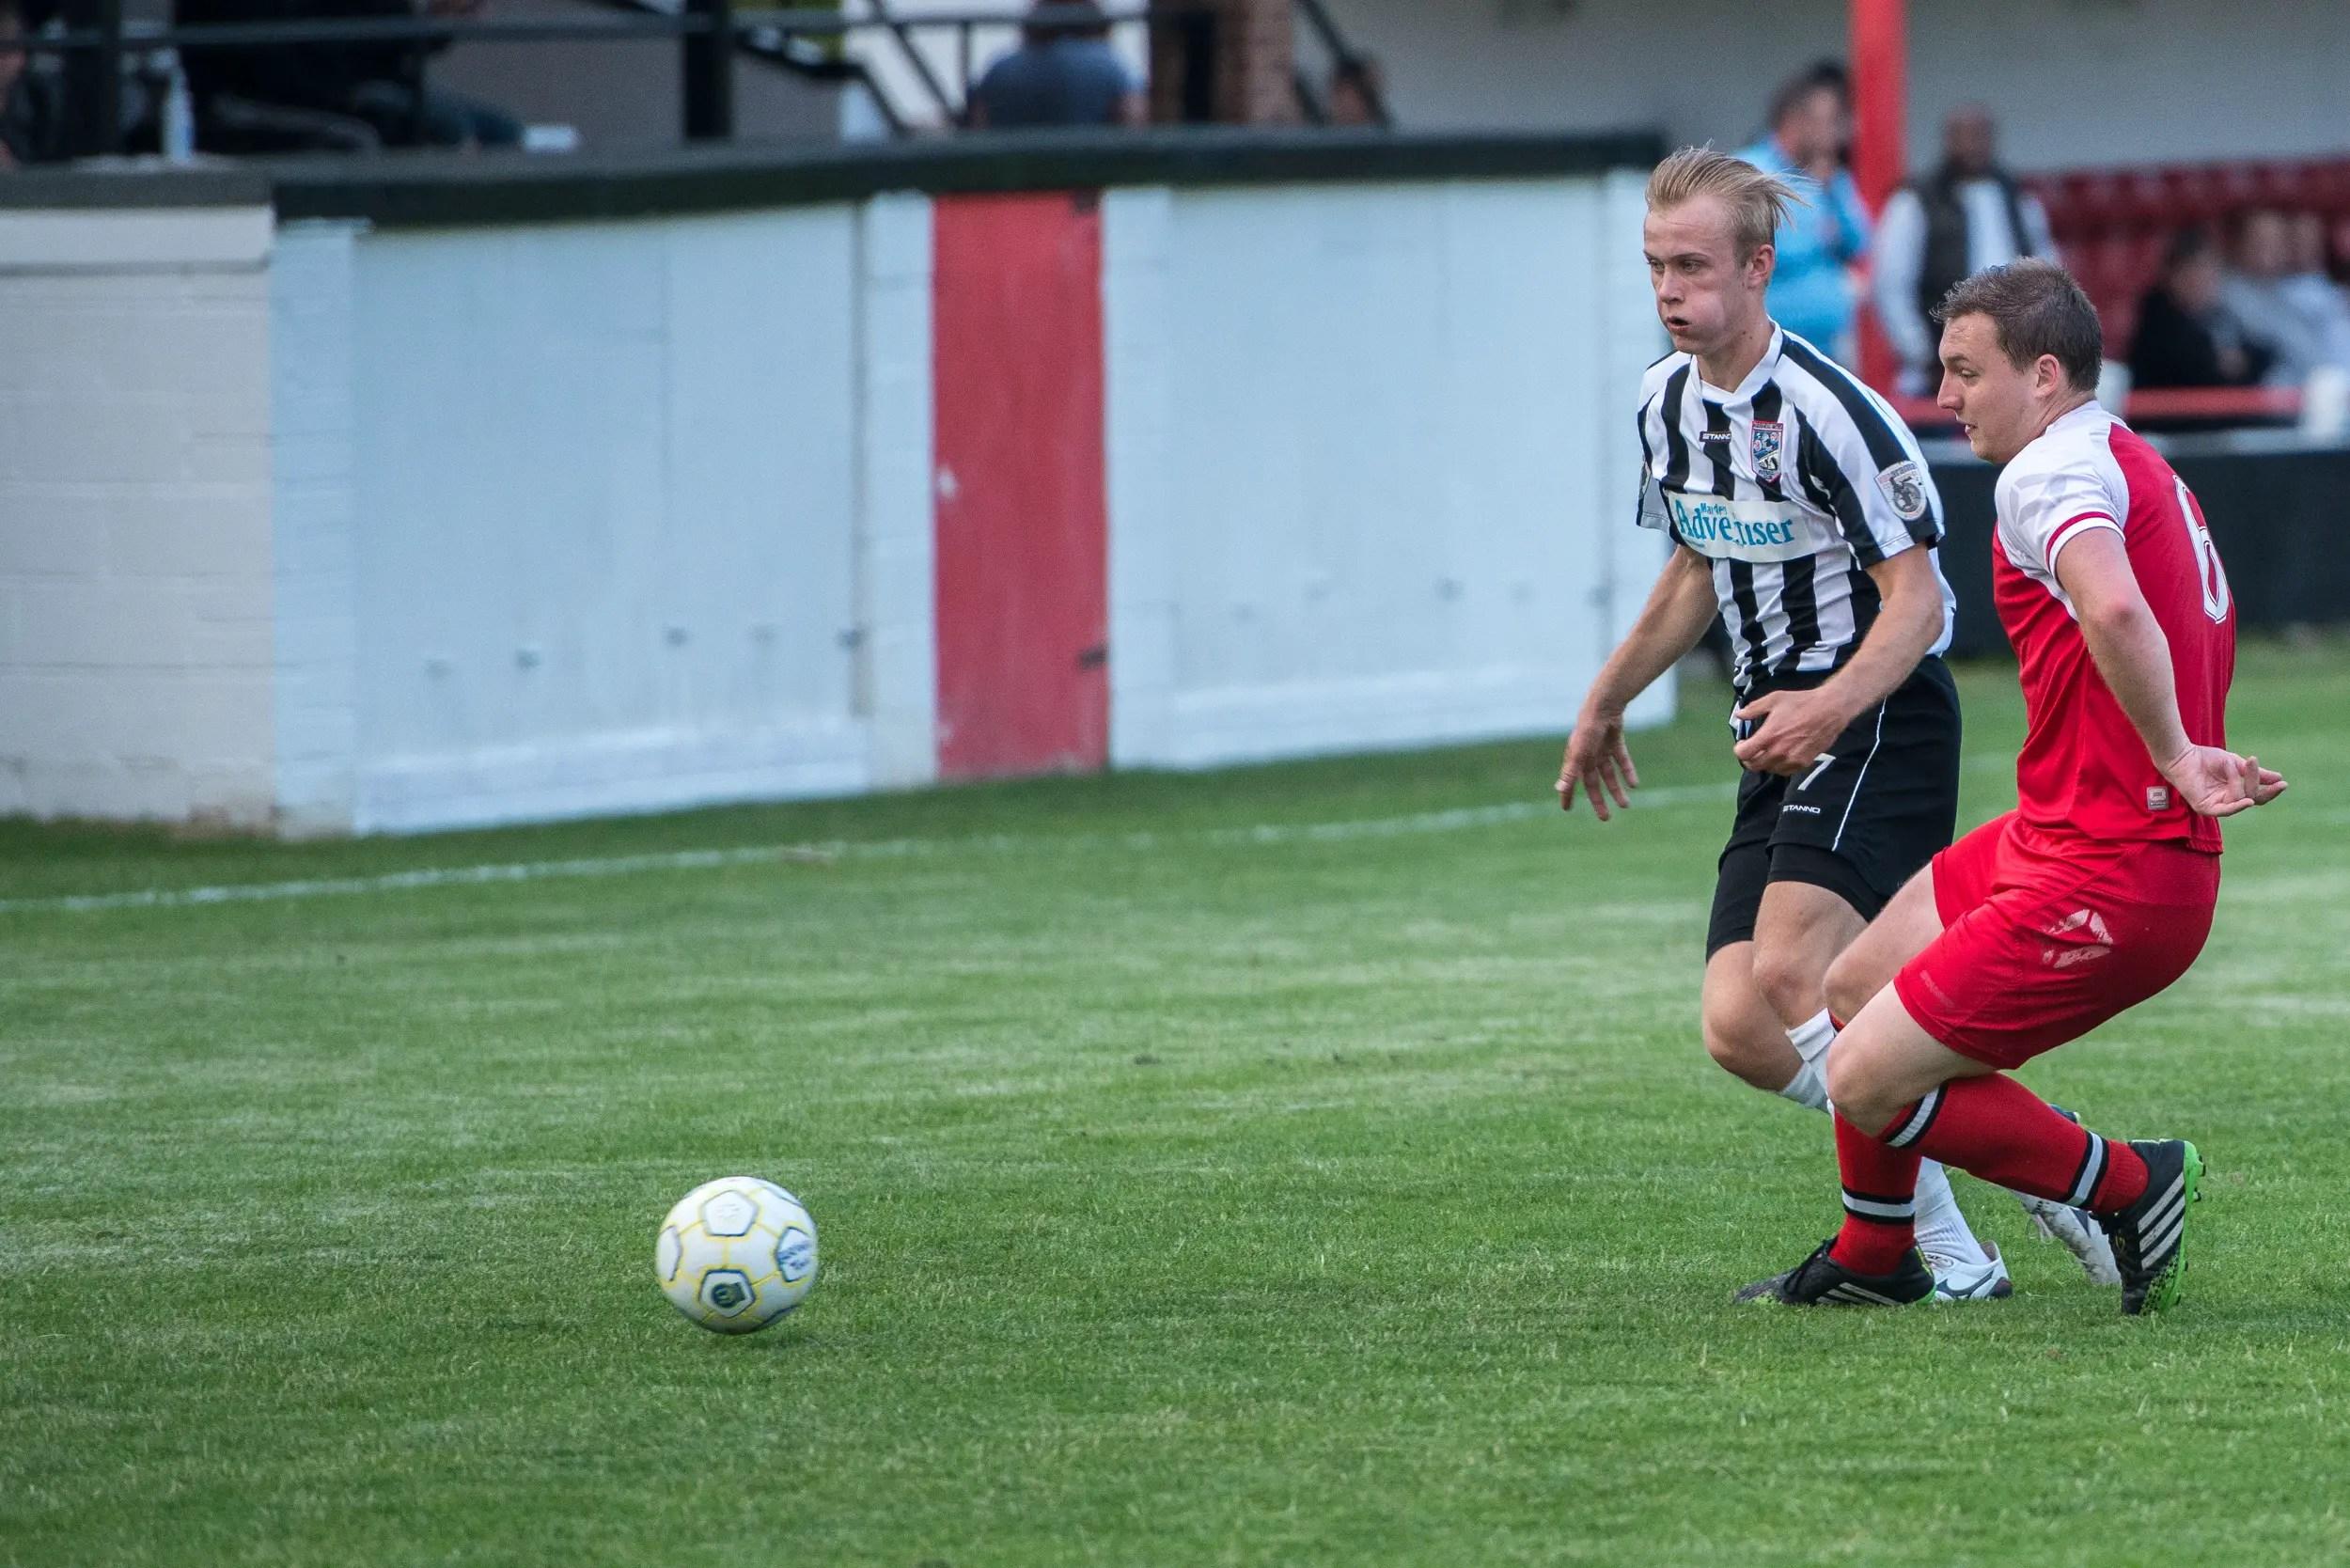 Watch Sam Barratt on BT Sport in the FA Cup